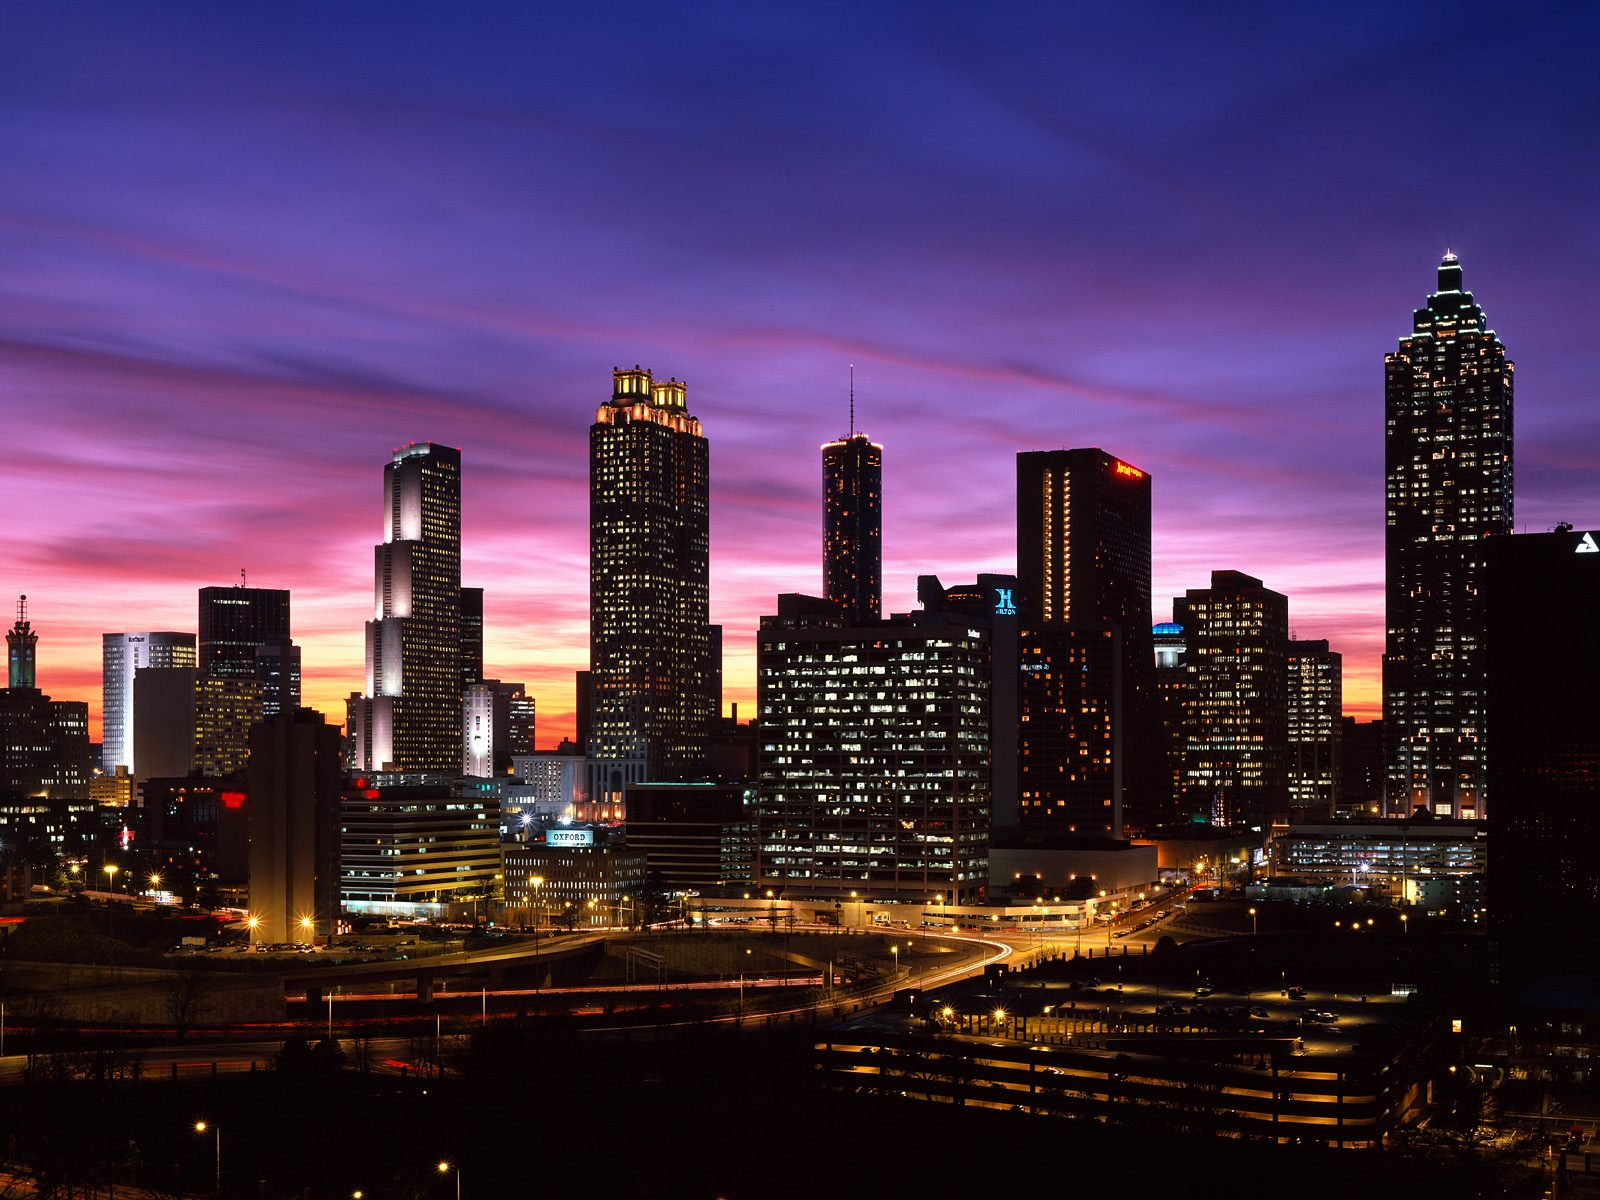 City Building Lights Wallpaper HD